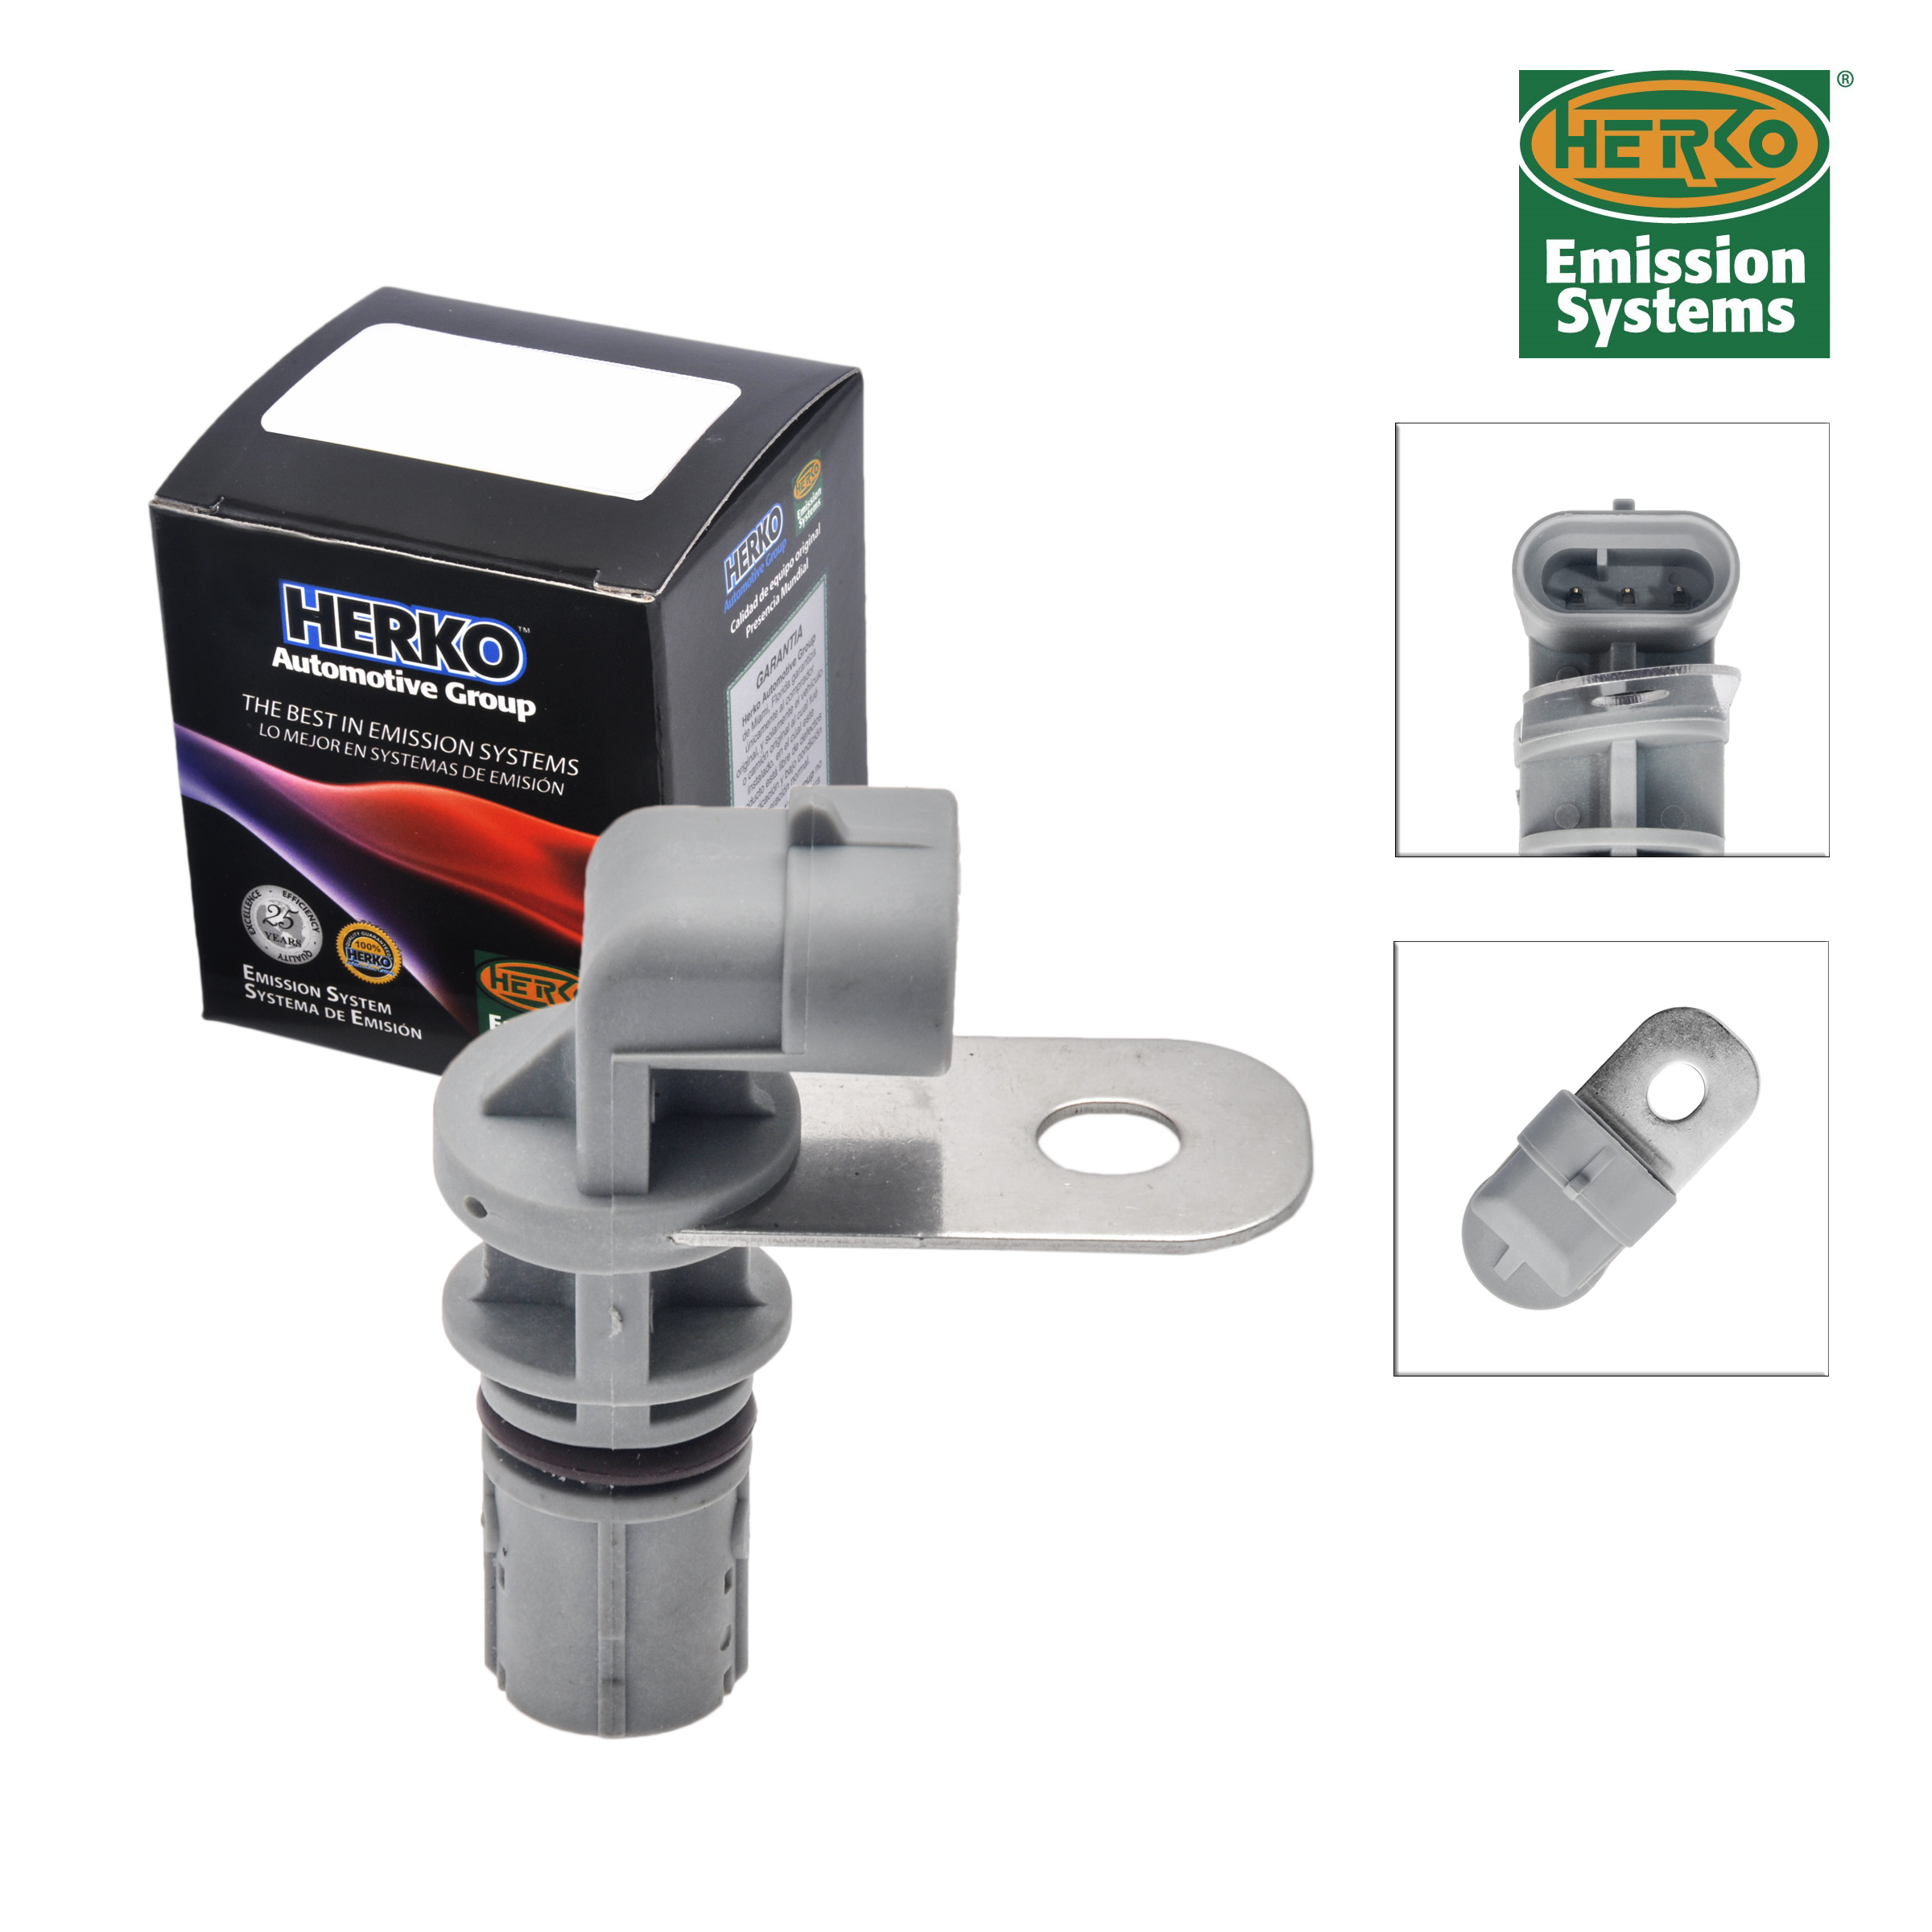 Crankshaft Position Sensor Code Fix: New Herko Crankshaft Position Sensor CKP2058